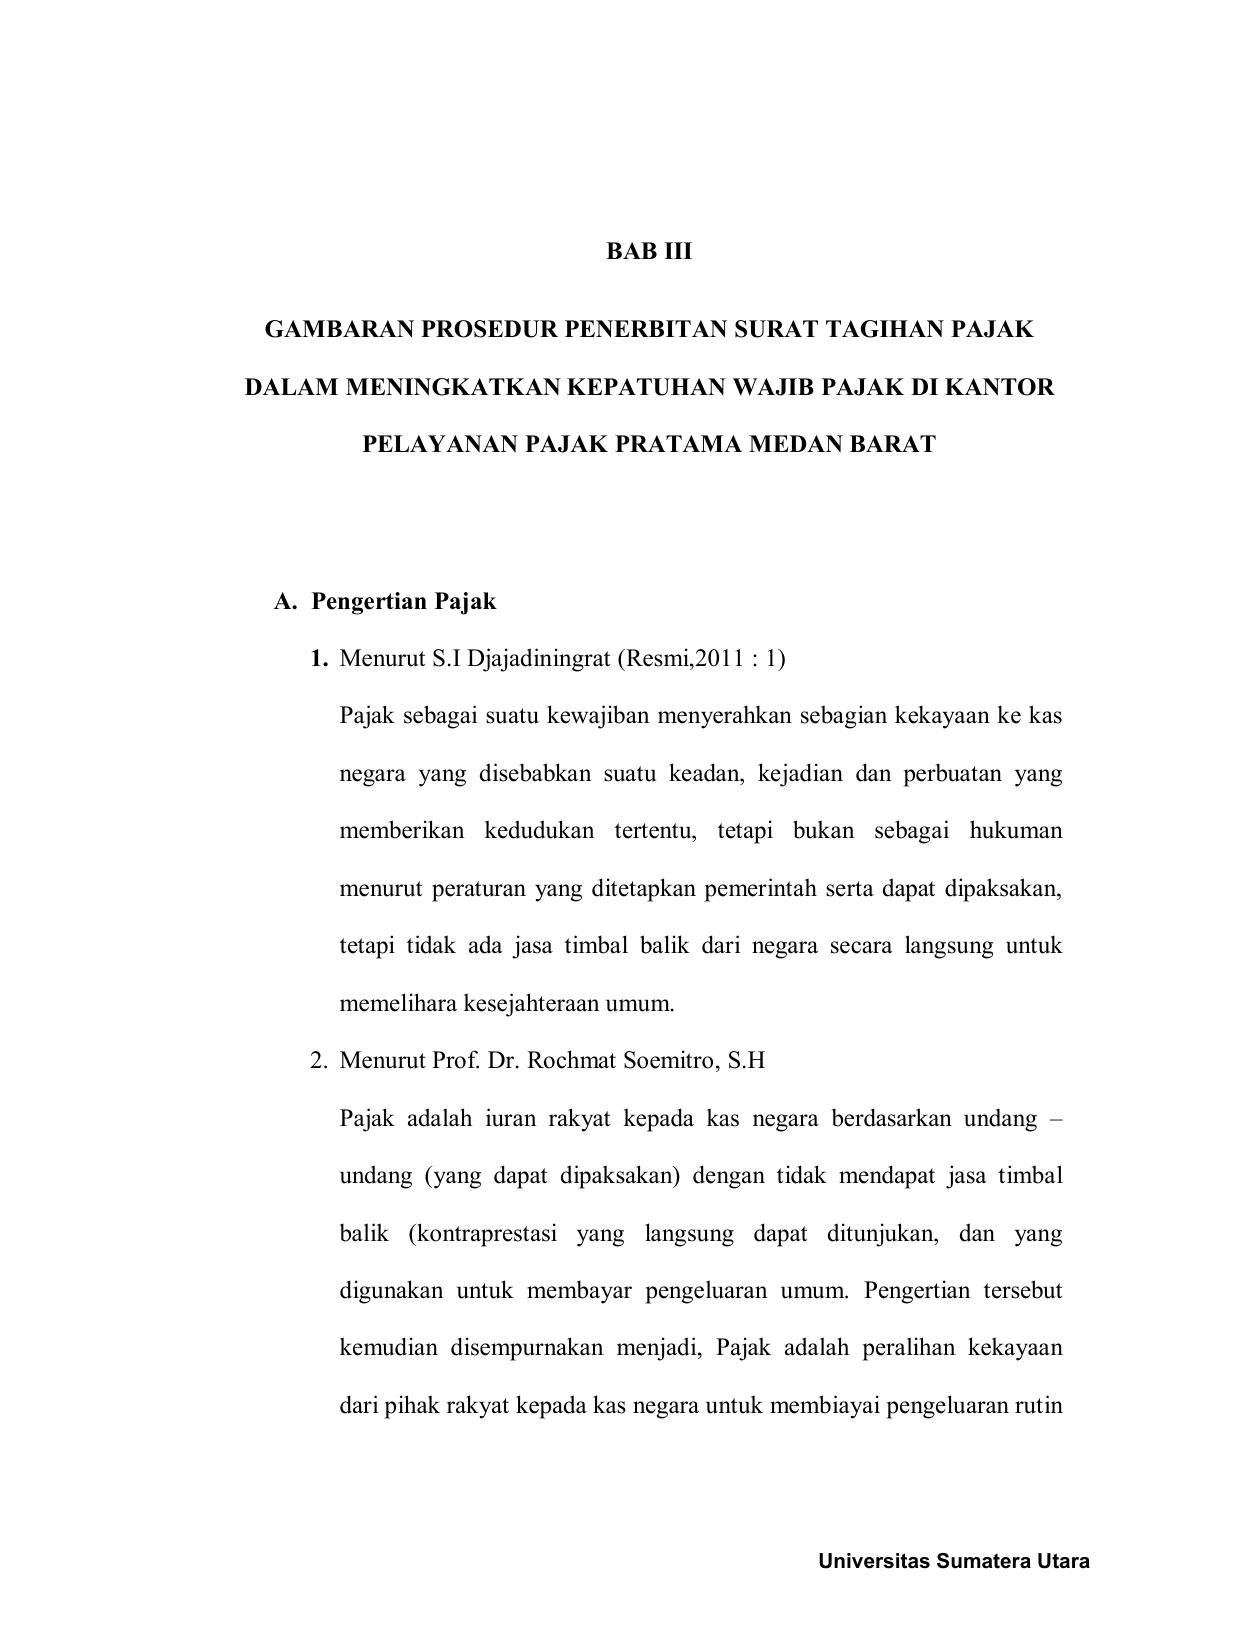 Bab Iii Gambaran Prosedur Penerbitan Surat Tagihan Pajak Dalam